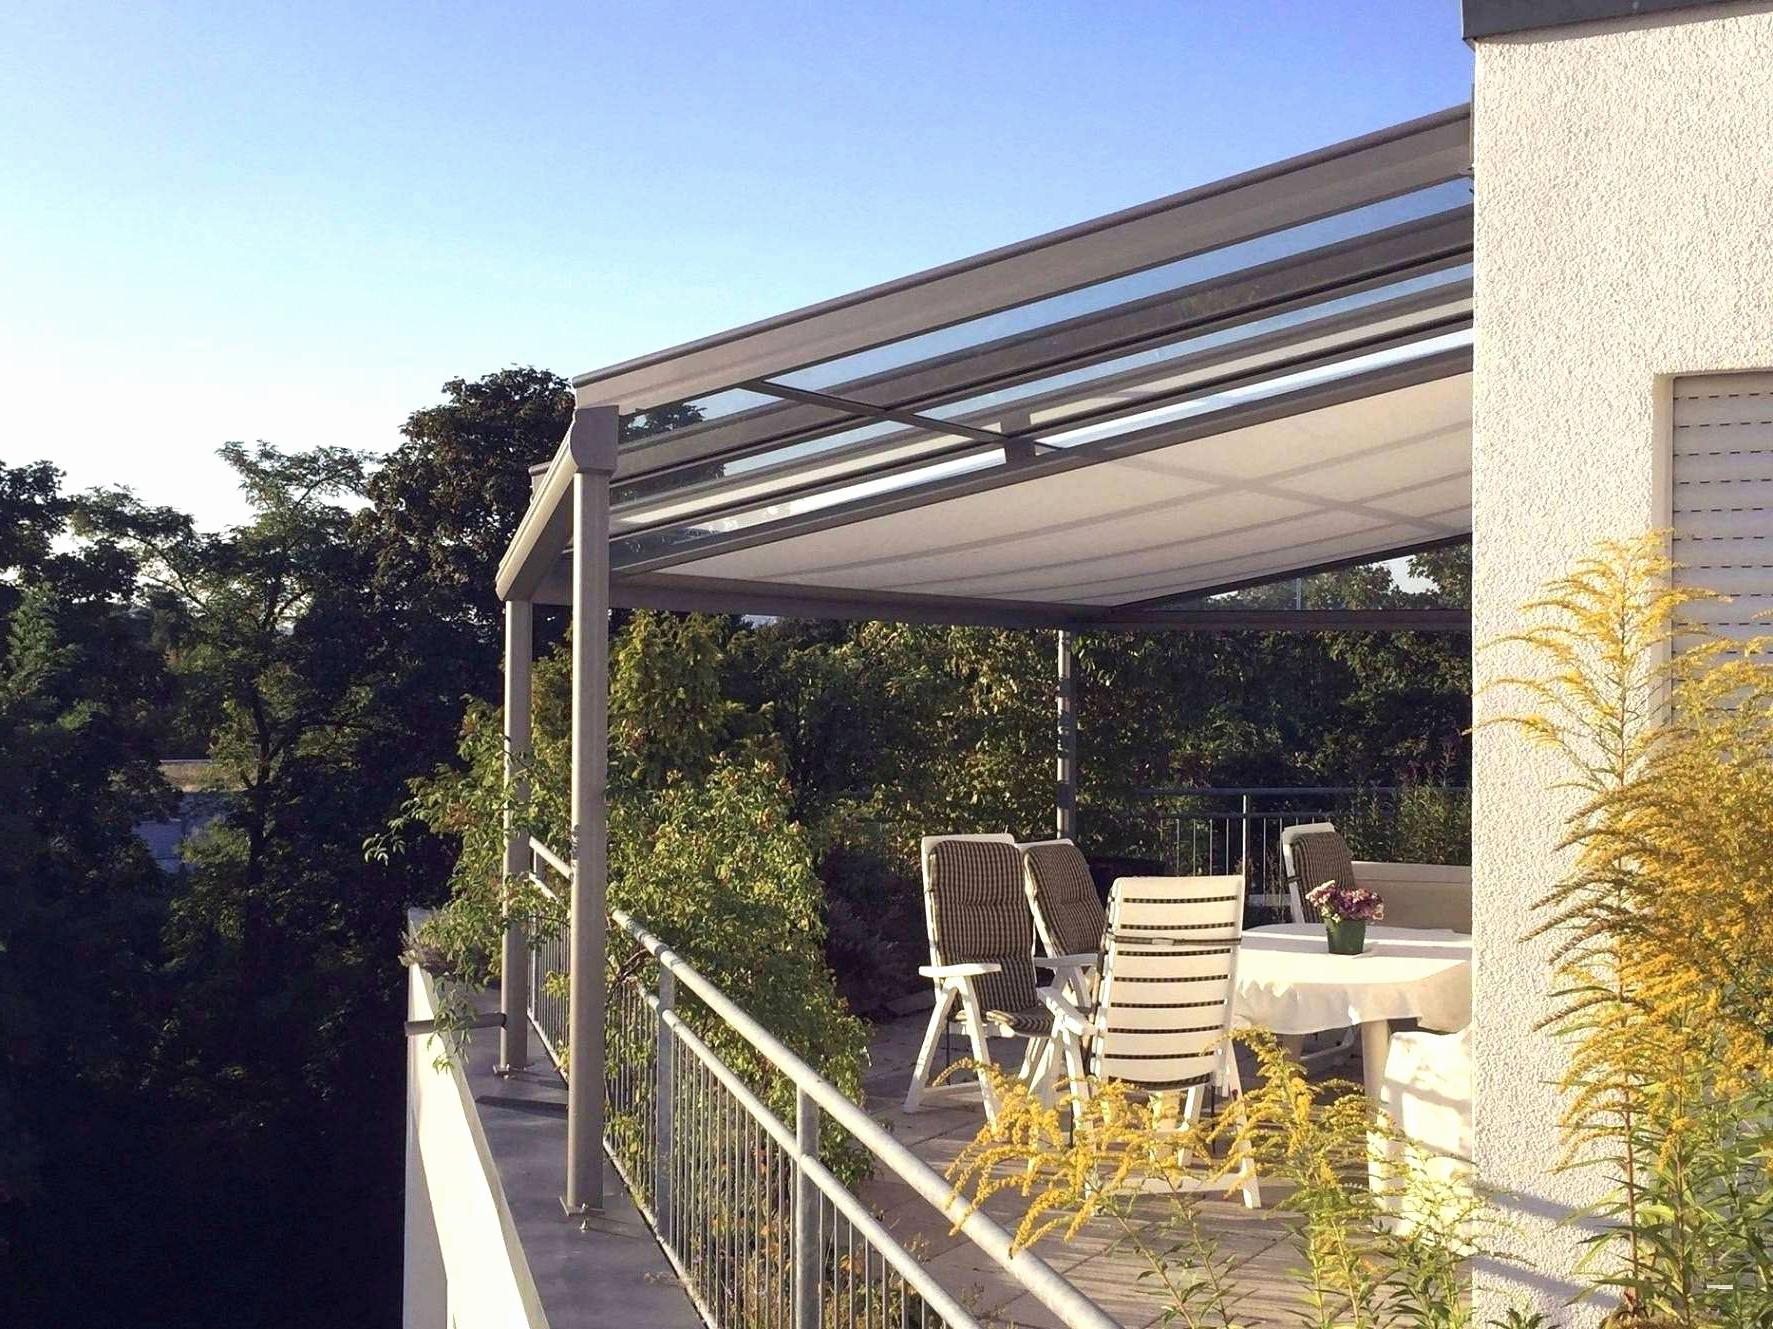 Bauerngarten Gestalten Ideen Luxus Gartengestaltung Modern 💌 20 Lovely Gartengestaltung